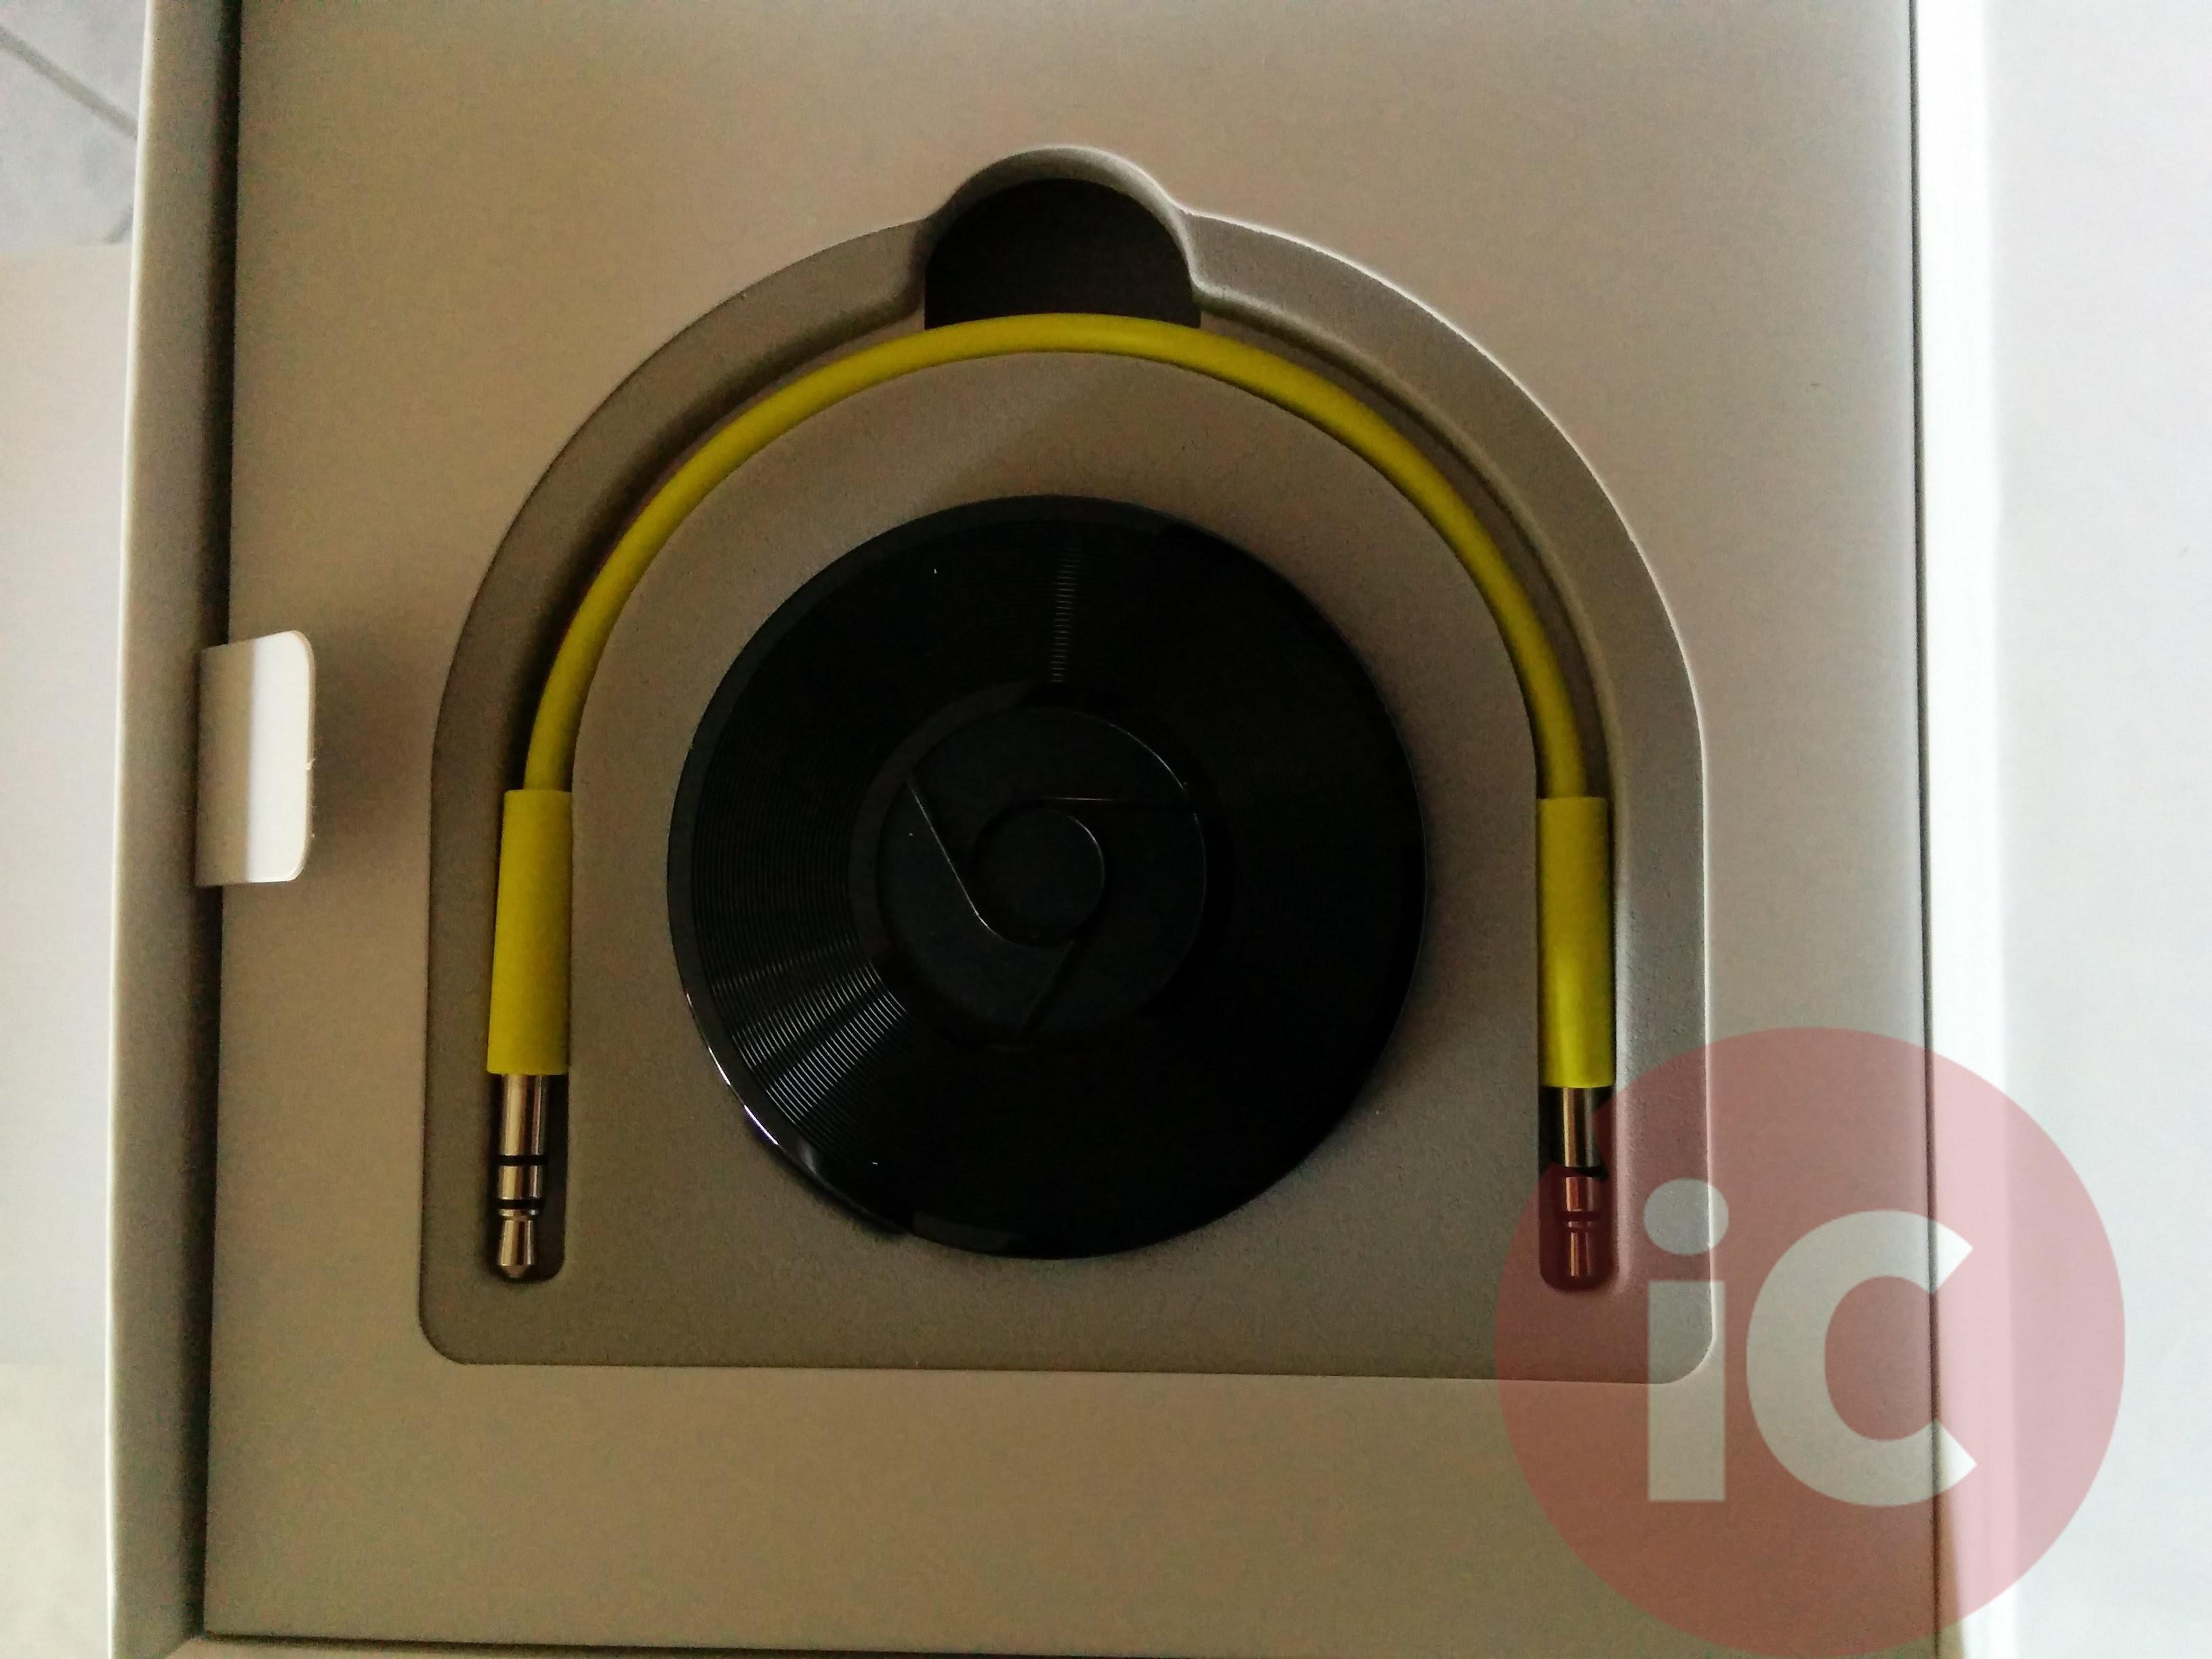 Chromecast_Audio_Box copy